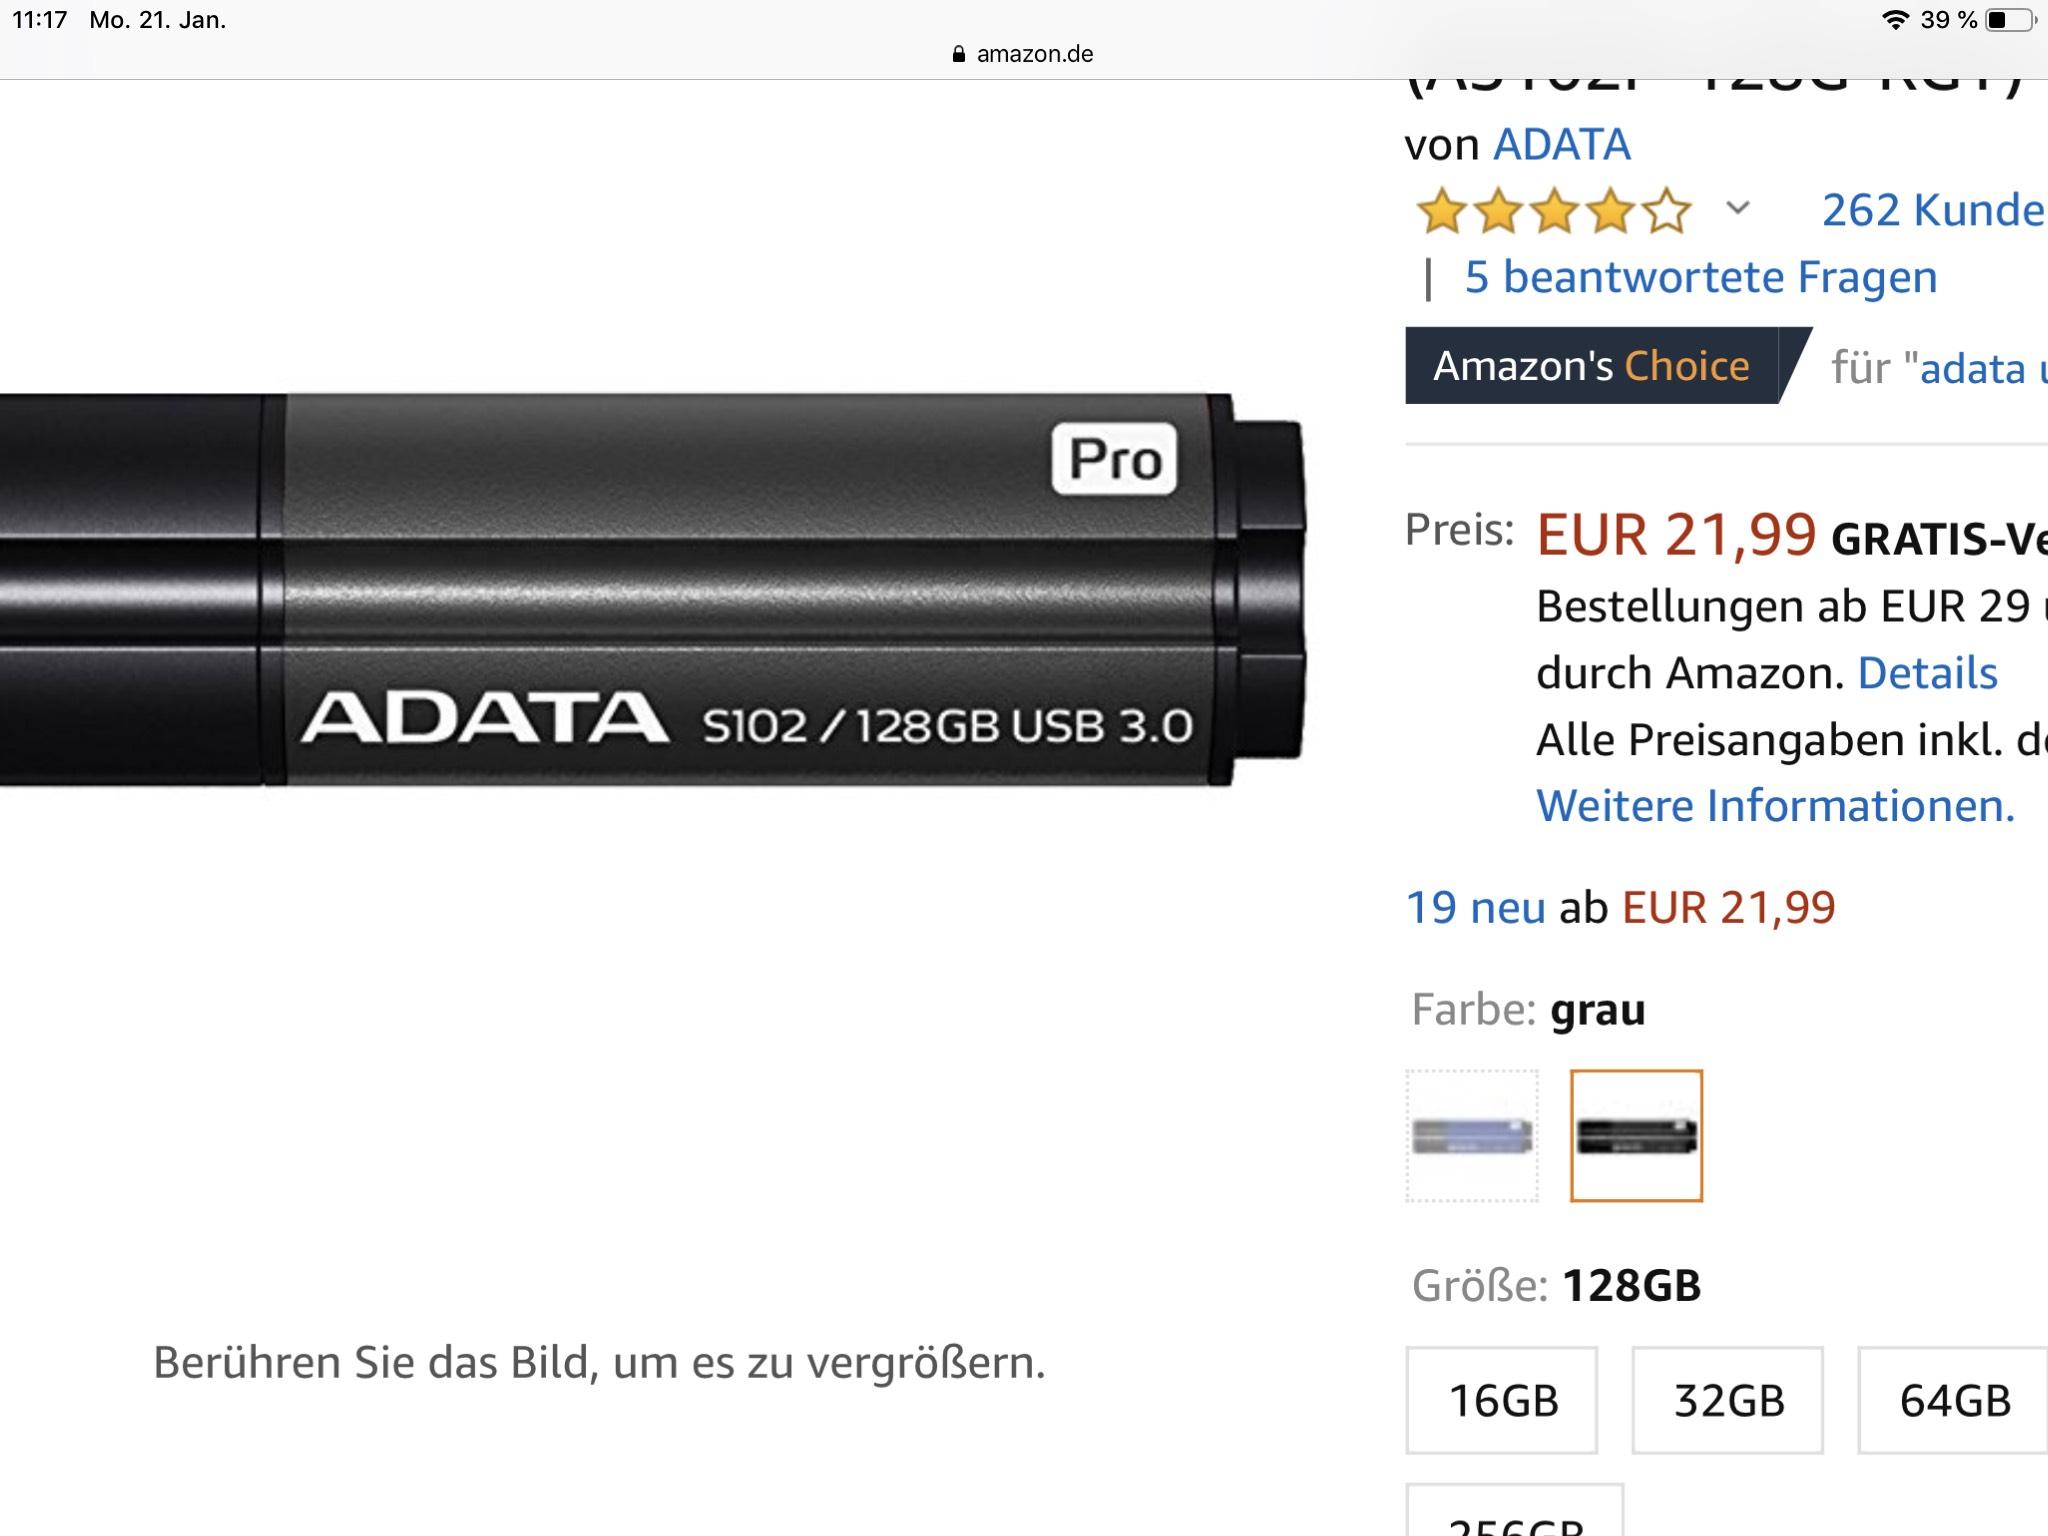 ADATA Stick - ADATA Elite S102P USB3.0 Flash Drive 128GB - 21,99 EUR.